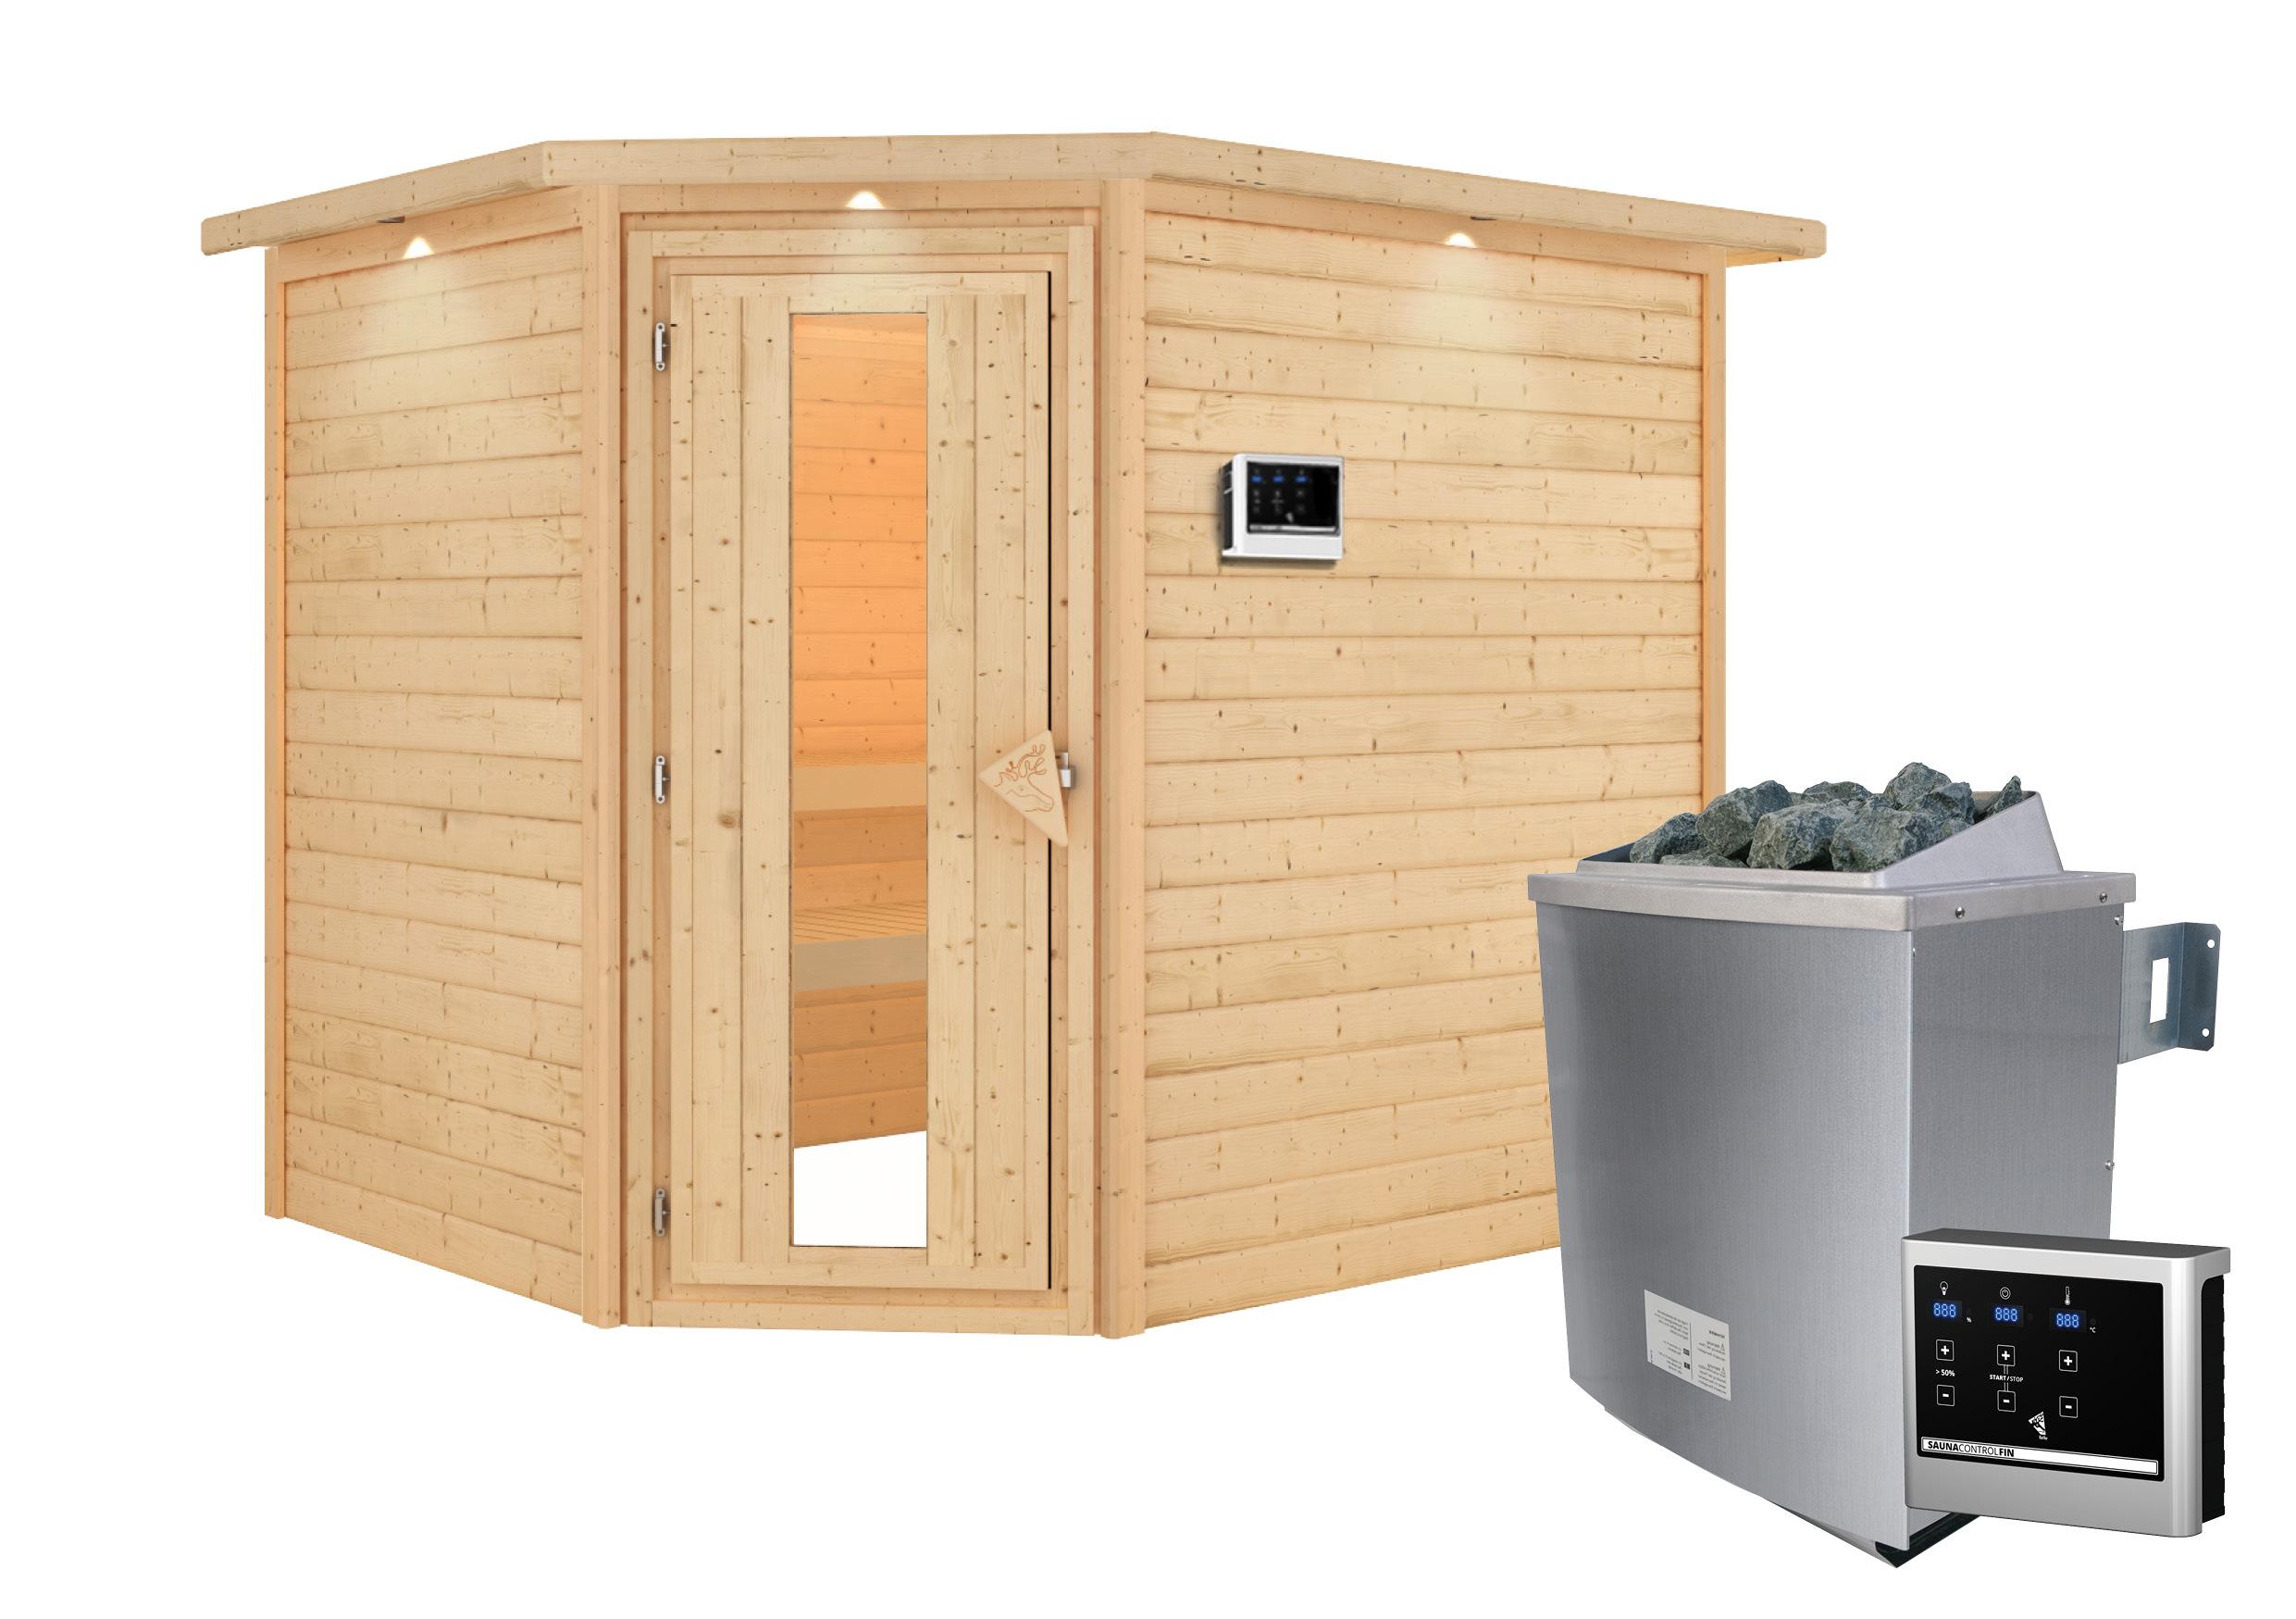 Woodfeeling Sauna Lisa 38mm Kranz Ofen 9kW extern Tür Holz Bild 2